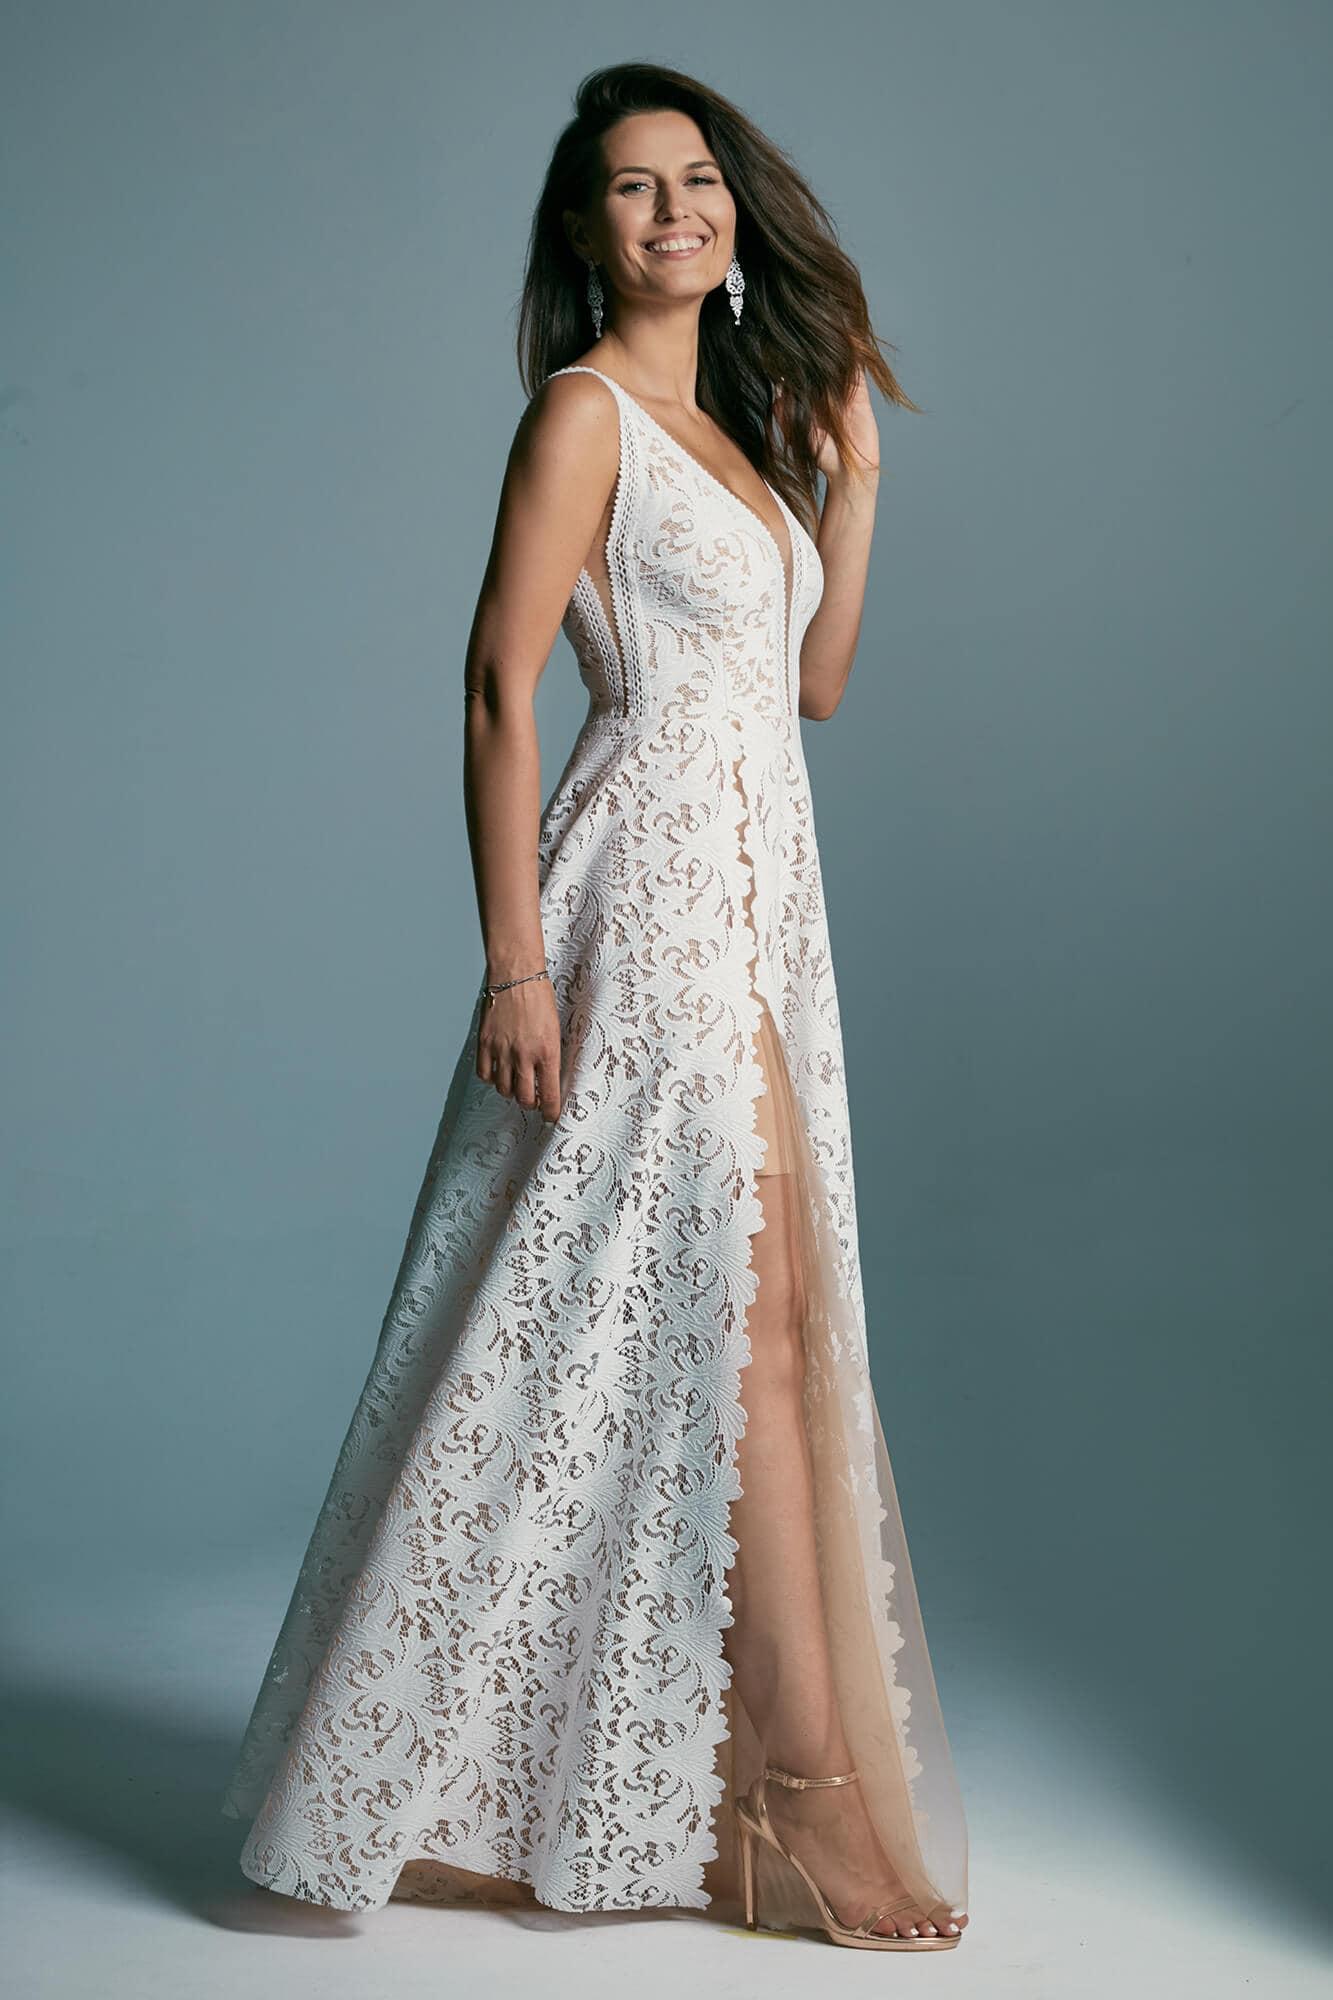 A classic-style wedding dress in warm white Santorini 1